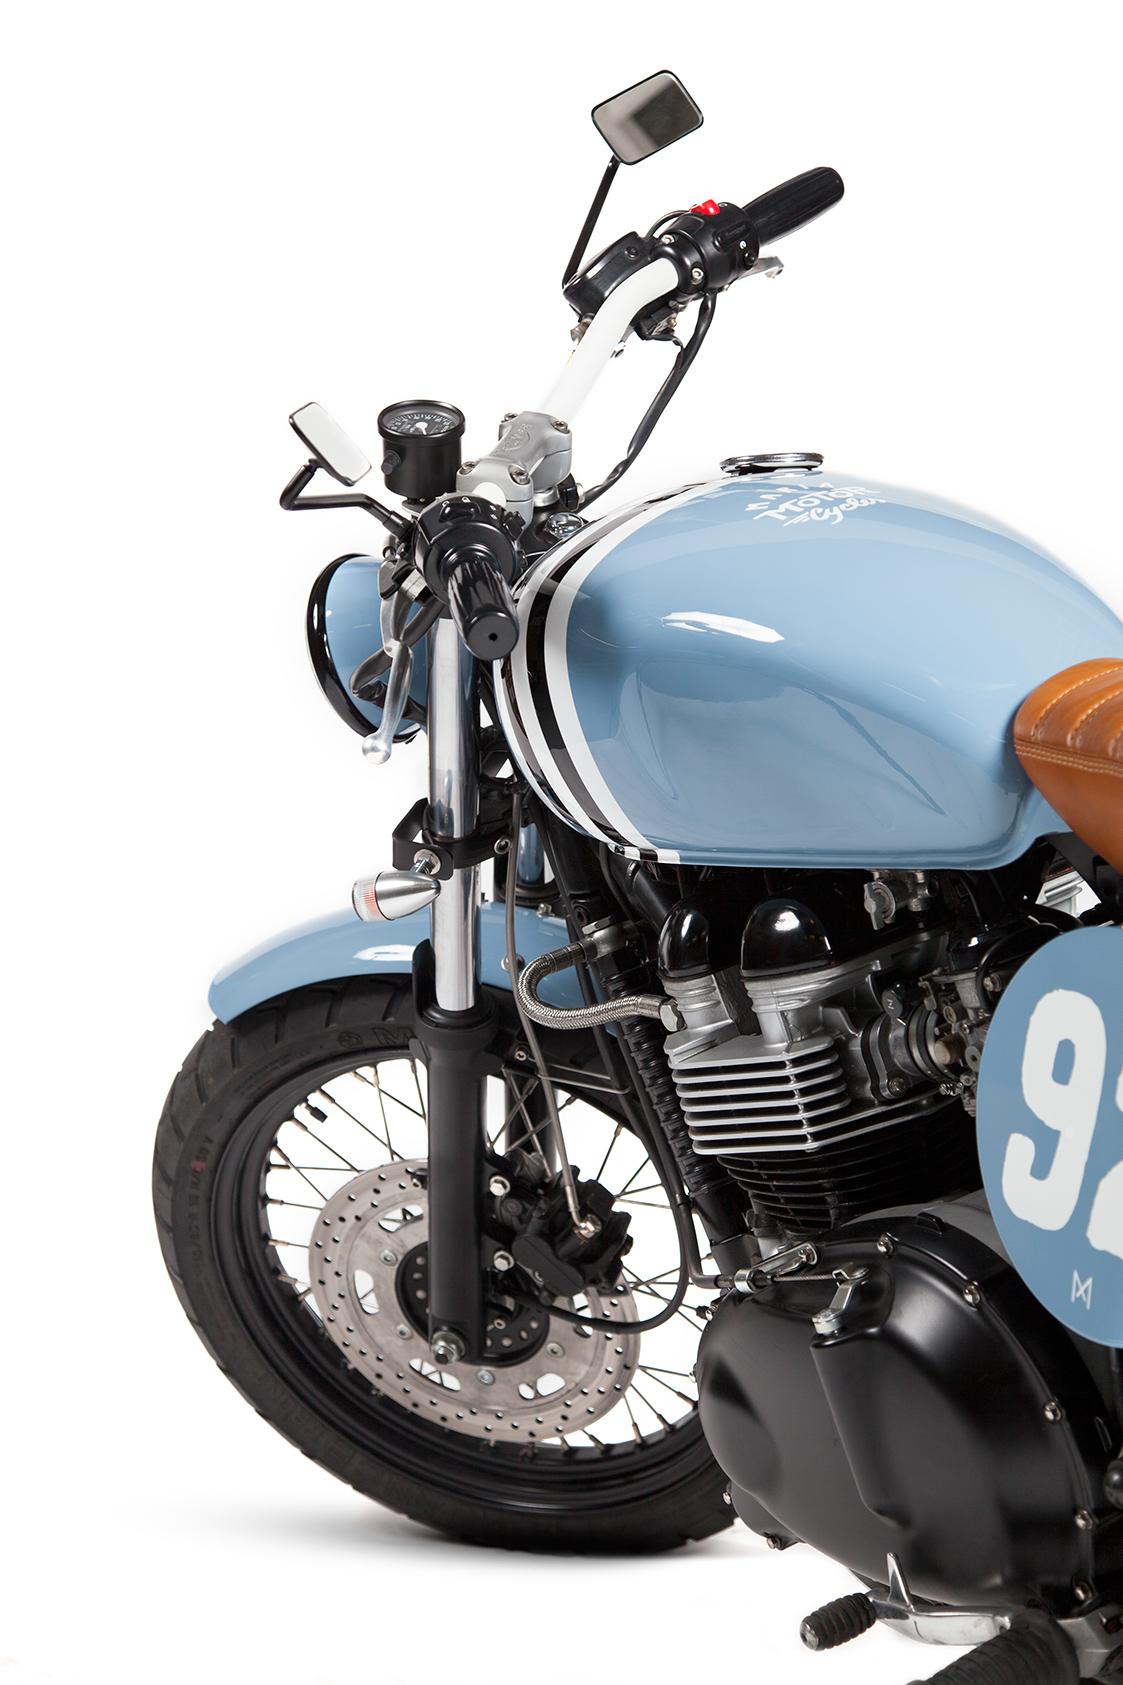 Maria_Motorcycles_Lieutenant_6007